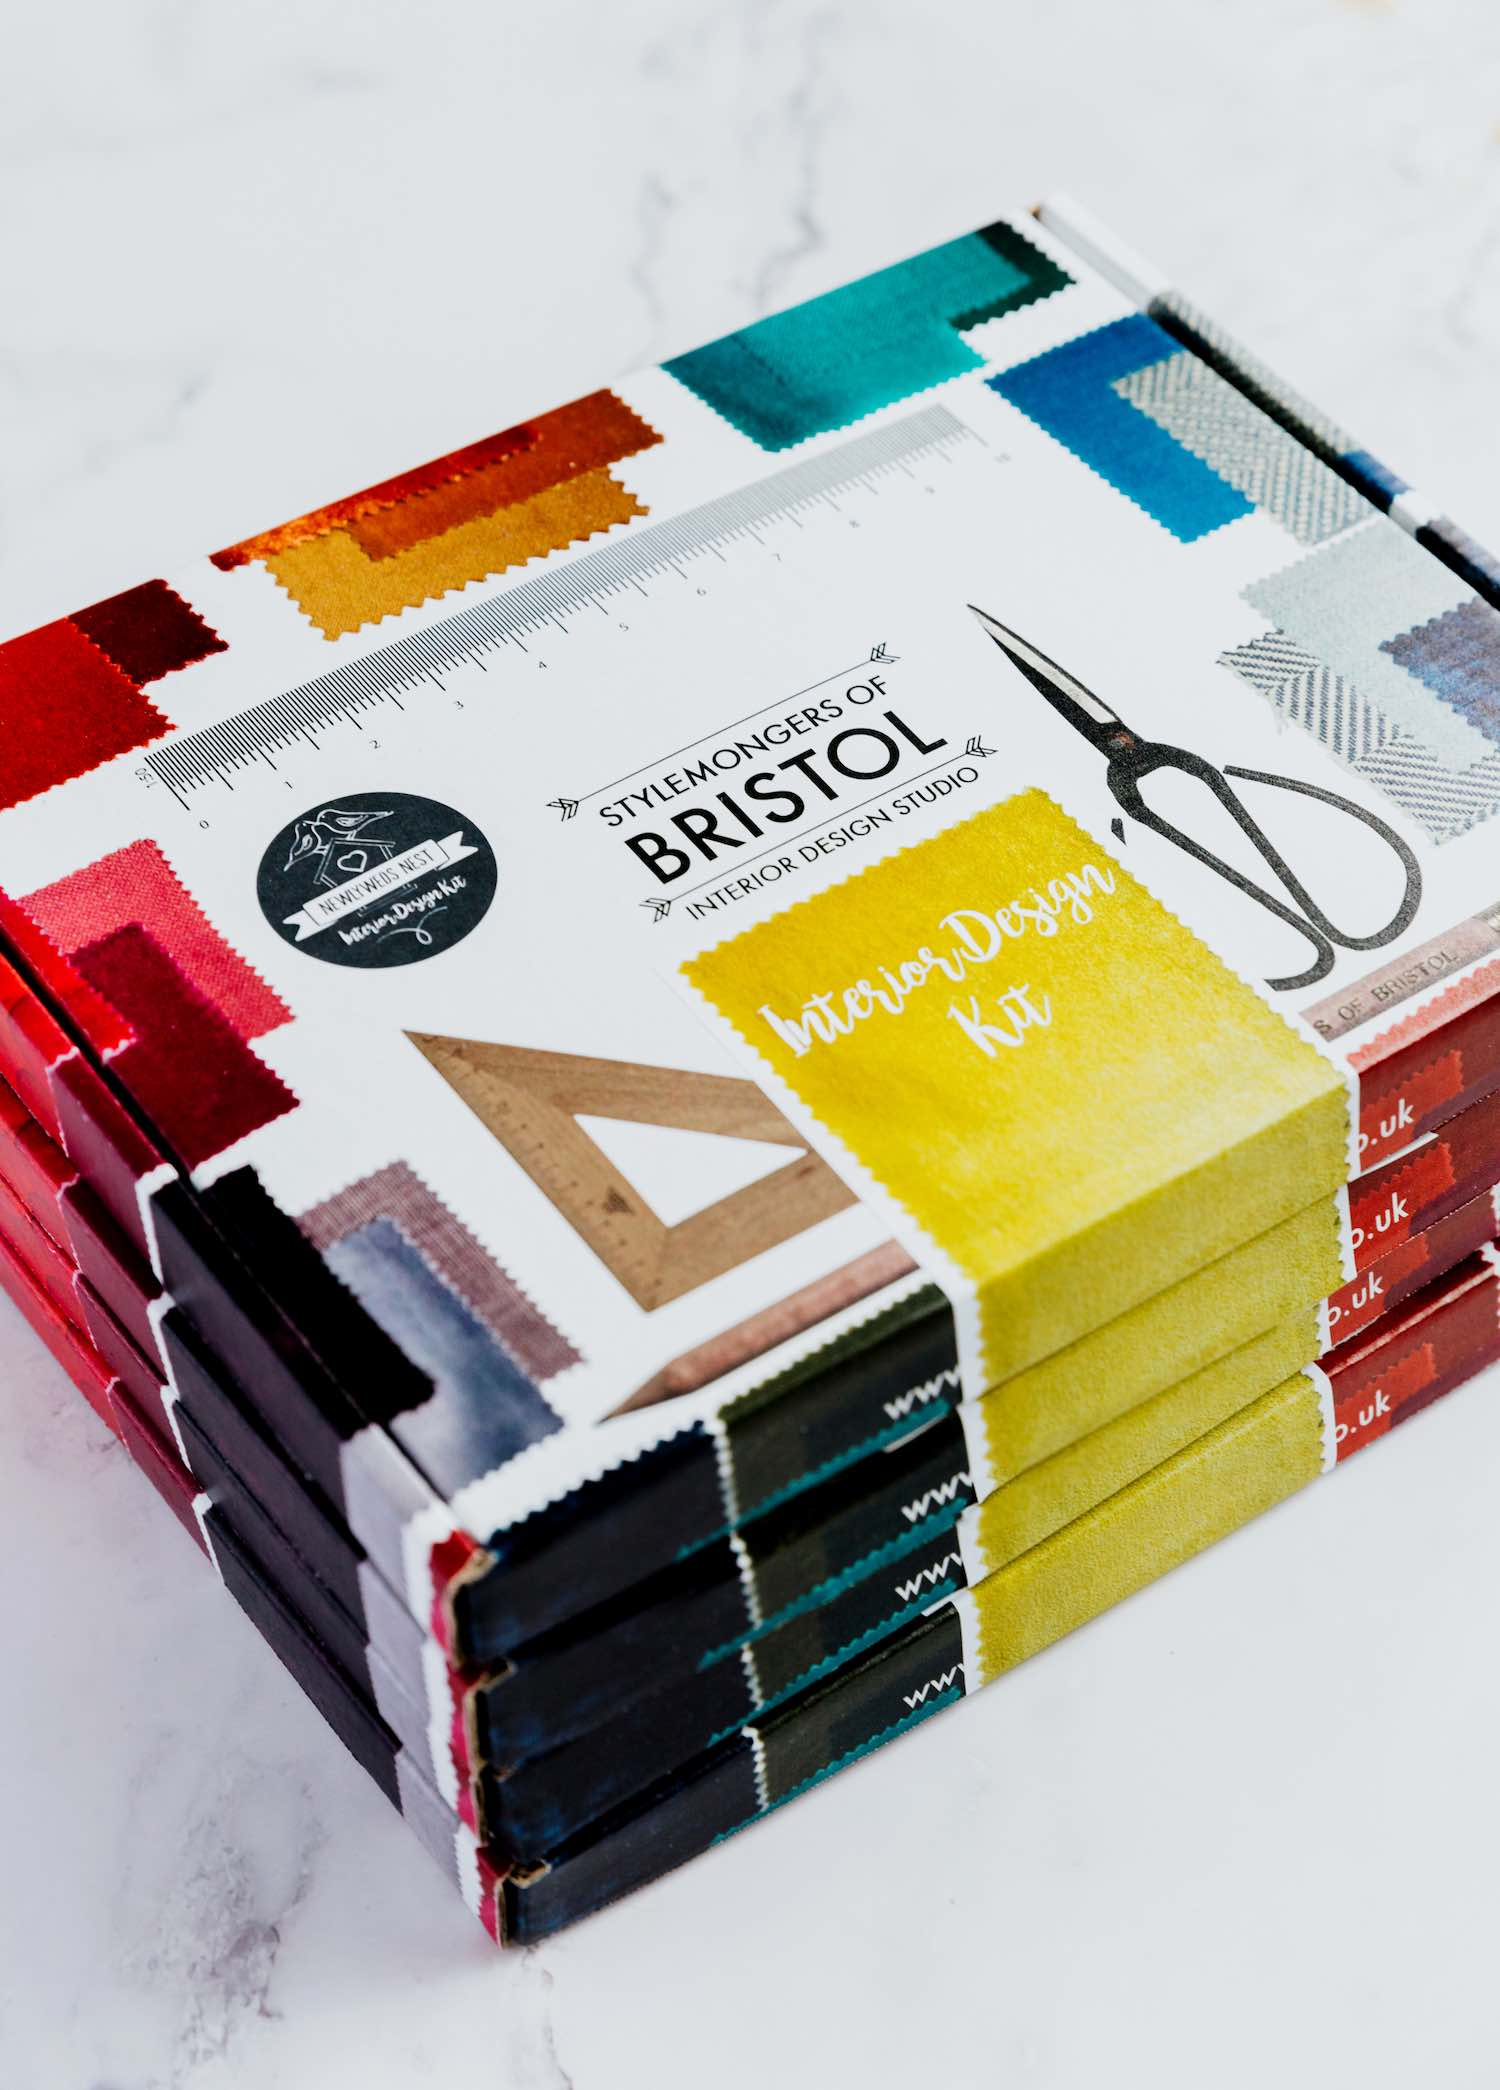 Stylemongers Of Bristol